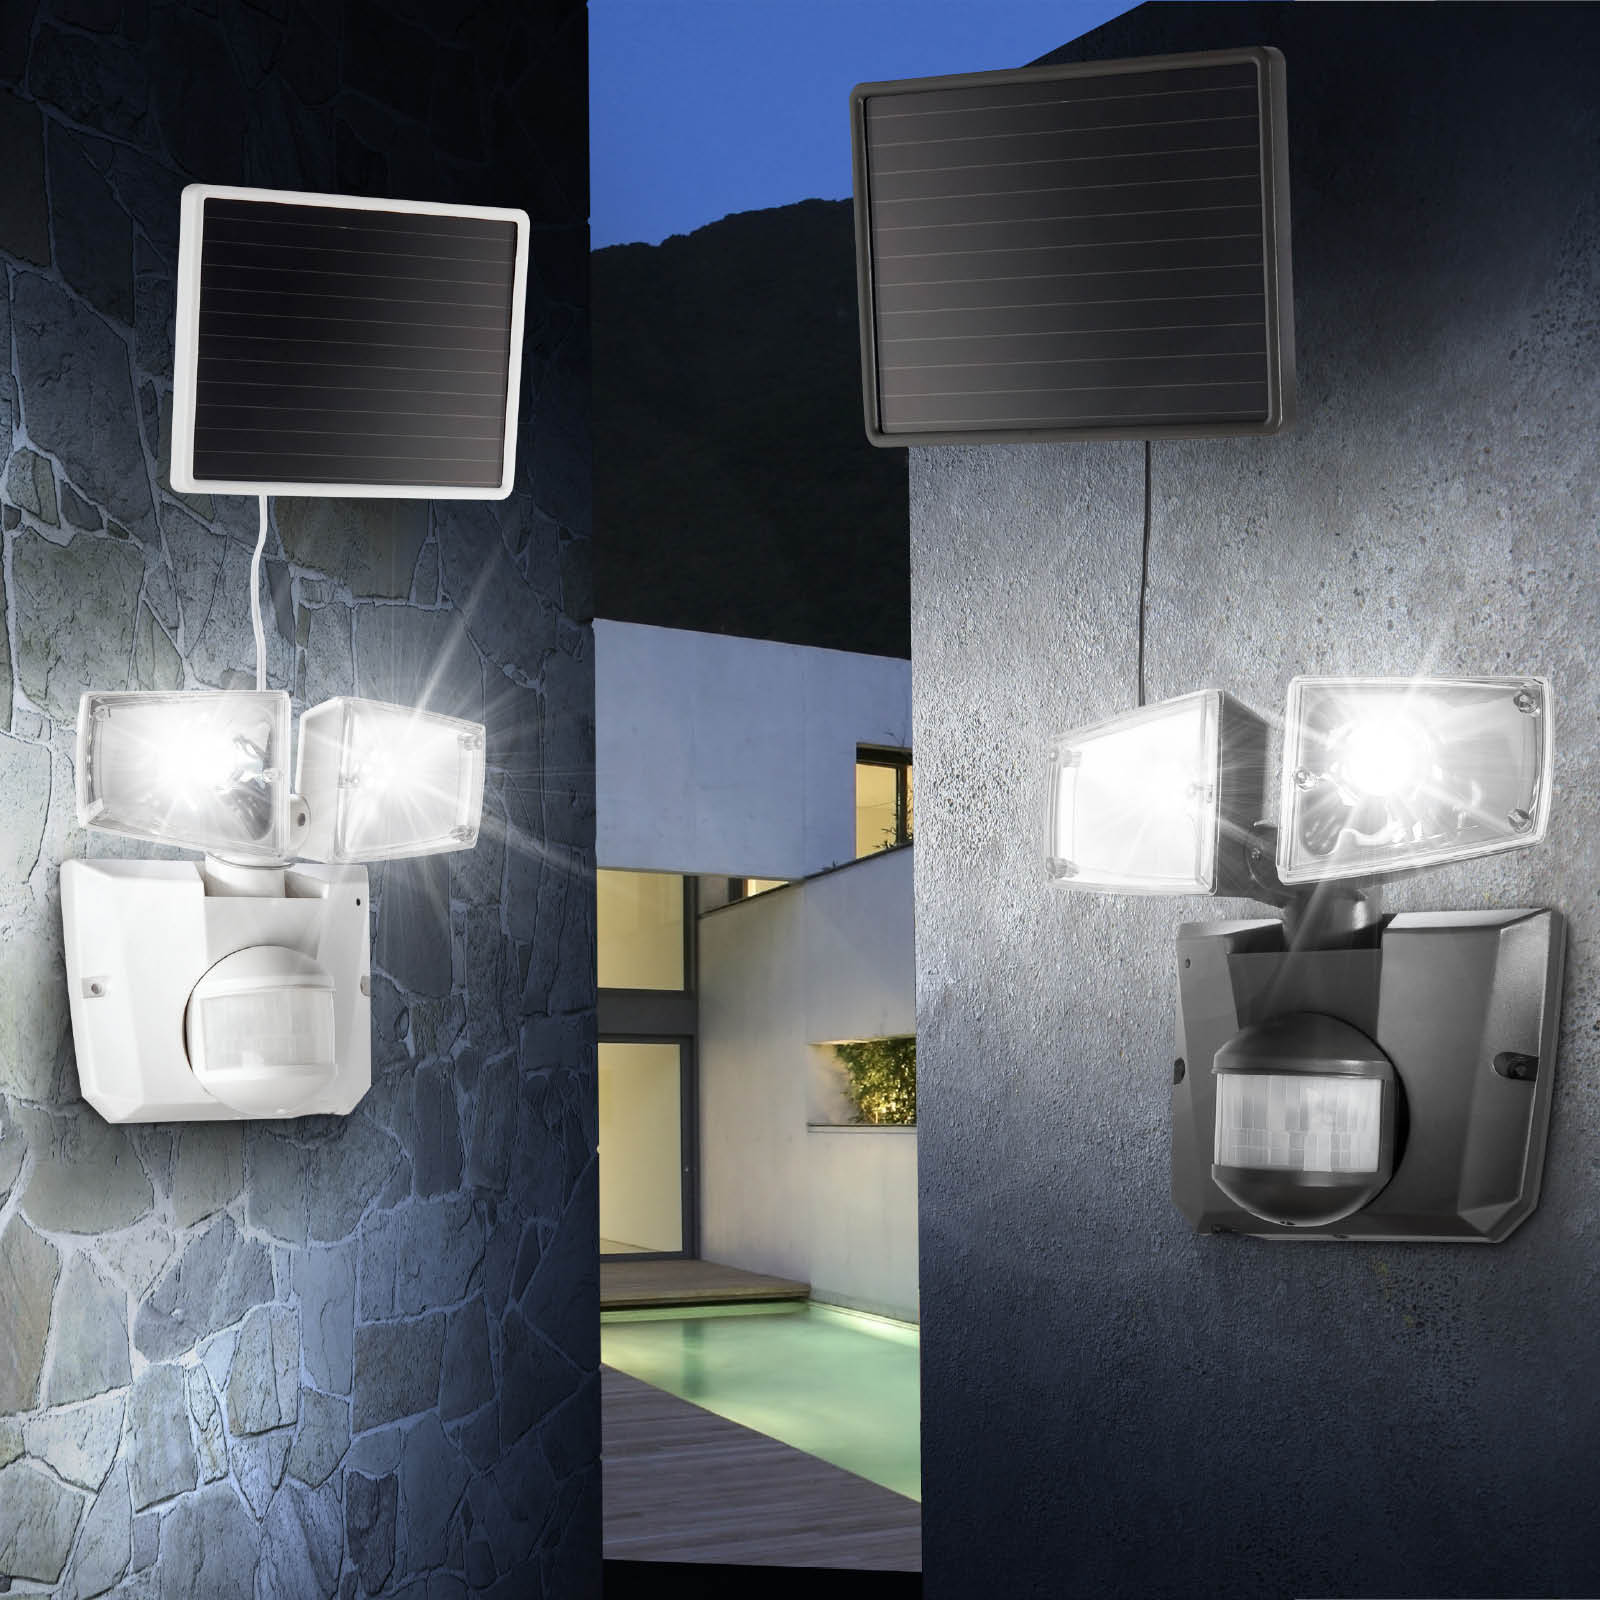 led solar wandleuchte mit bewegungsmelder solarleuchte solarstrahler solarlampe ebay. Black Bedroom Furniture Sets. Home Design Ideas